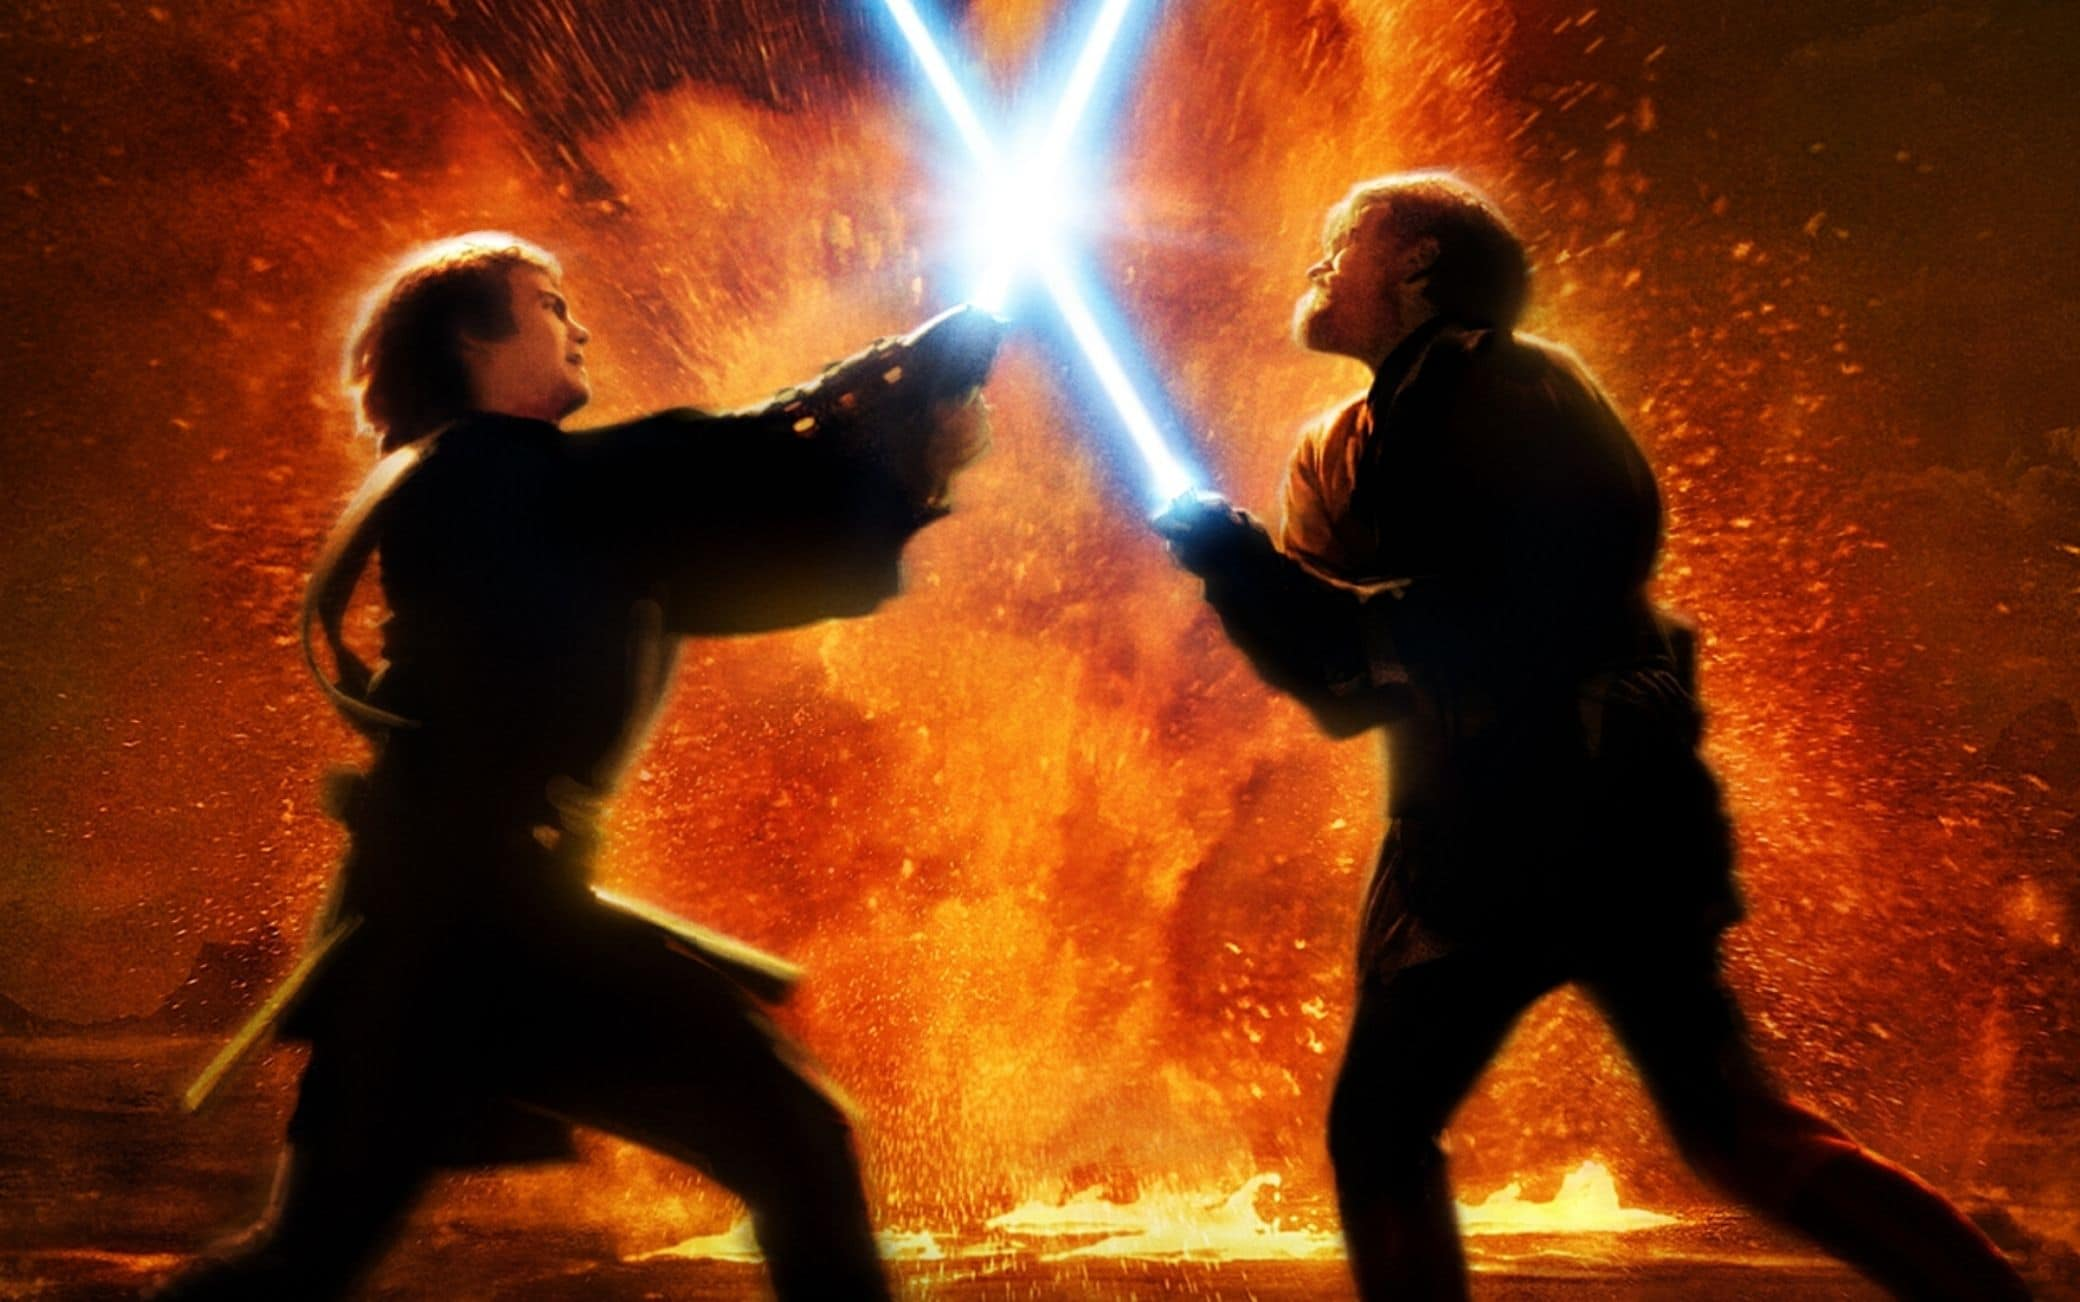 The duel between Anakin Skywalker and Obi-Wan Kenobi on Mustafar in Star Wars: Revenge of the Sith